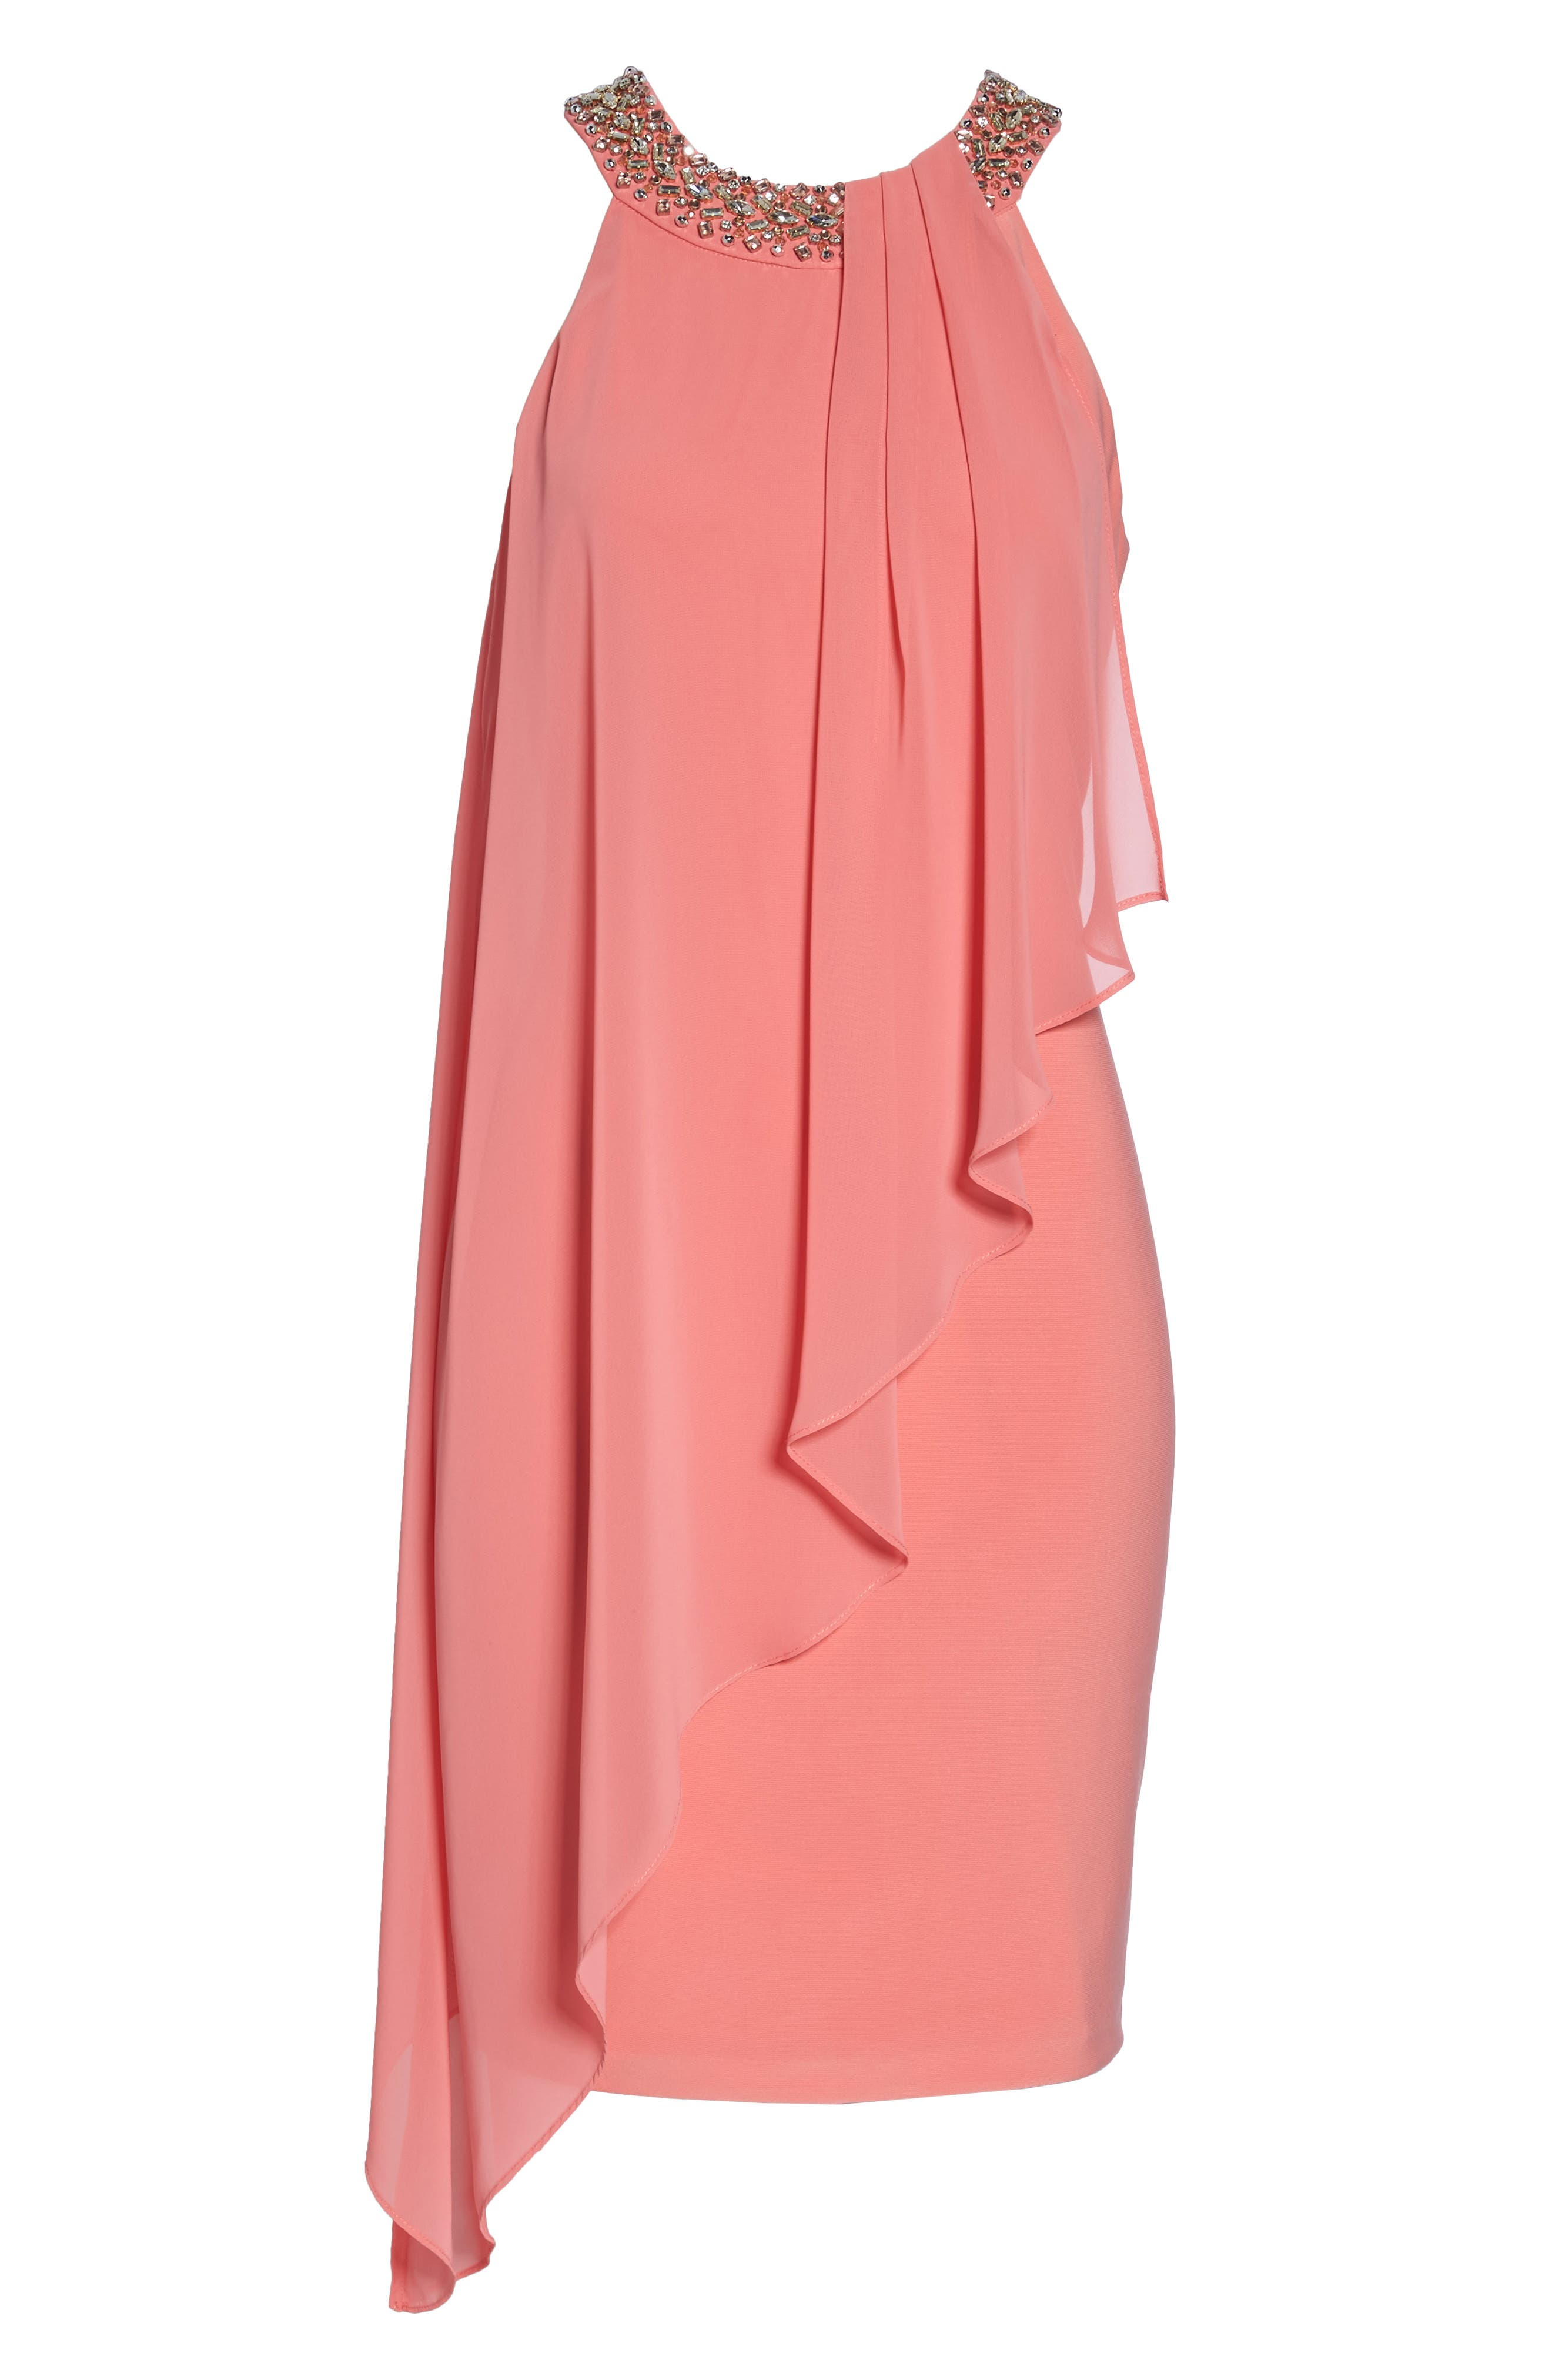 Embellished Chiffon Overlay A-Line Dress,                             Alternate thumbnail 6, color,                             651